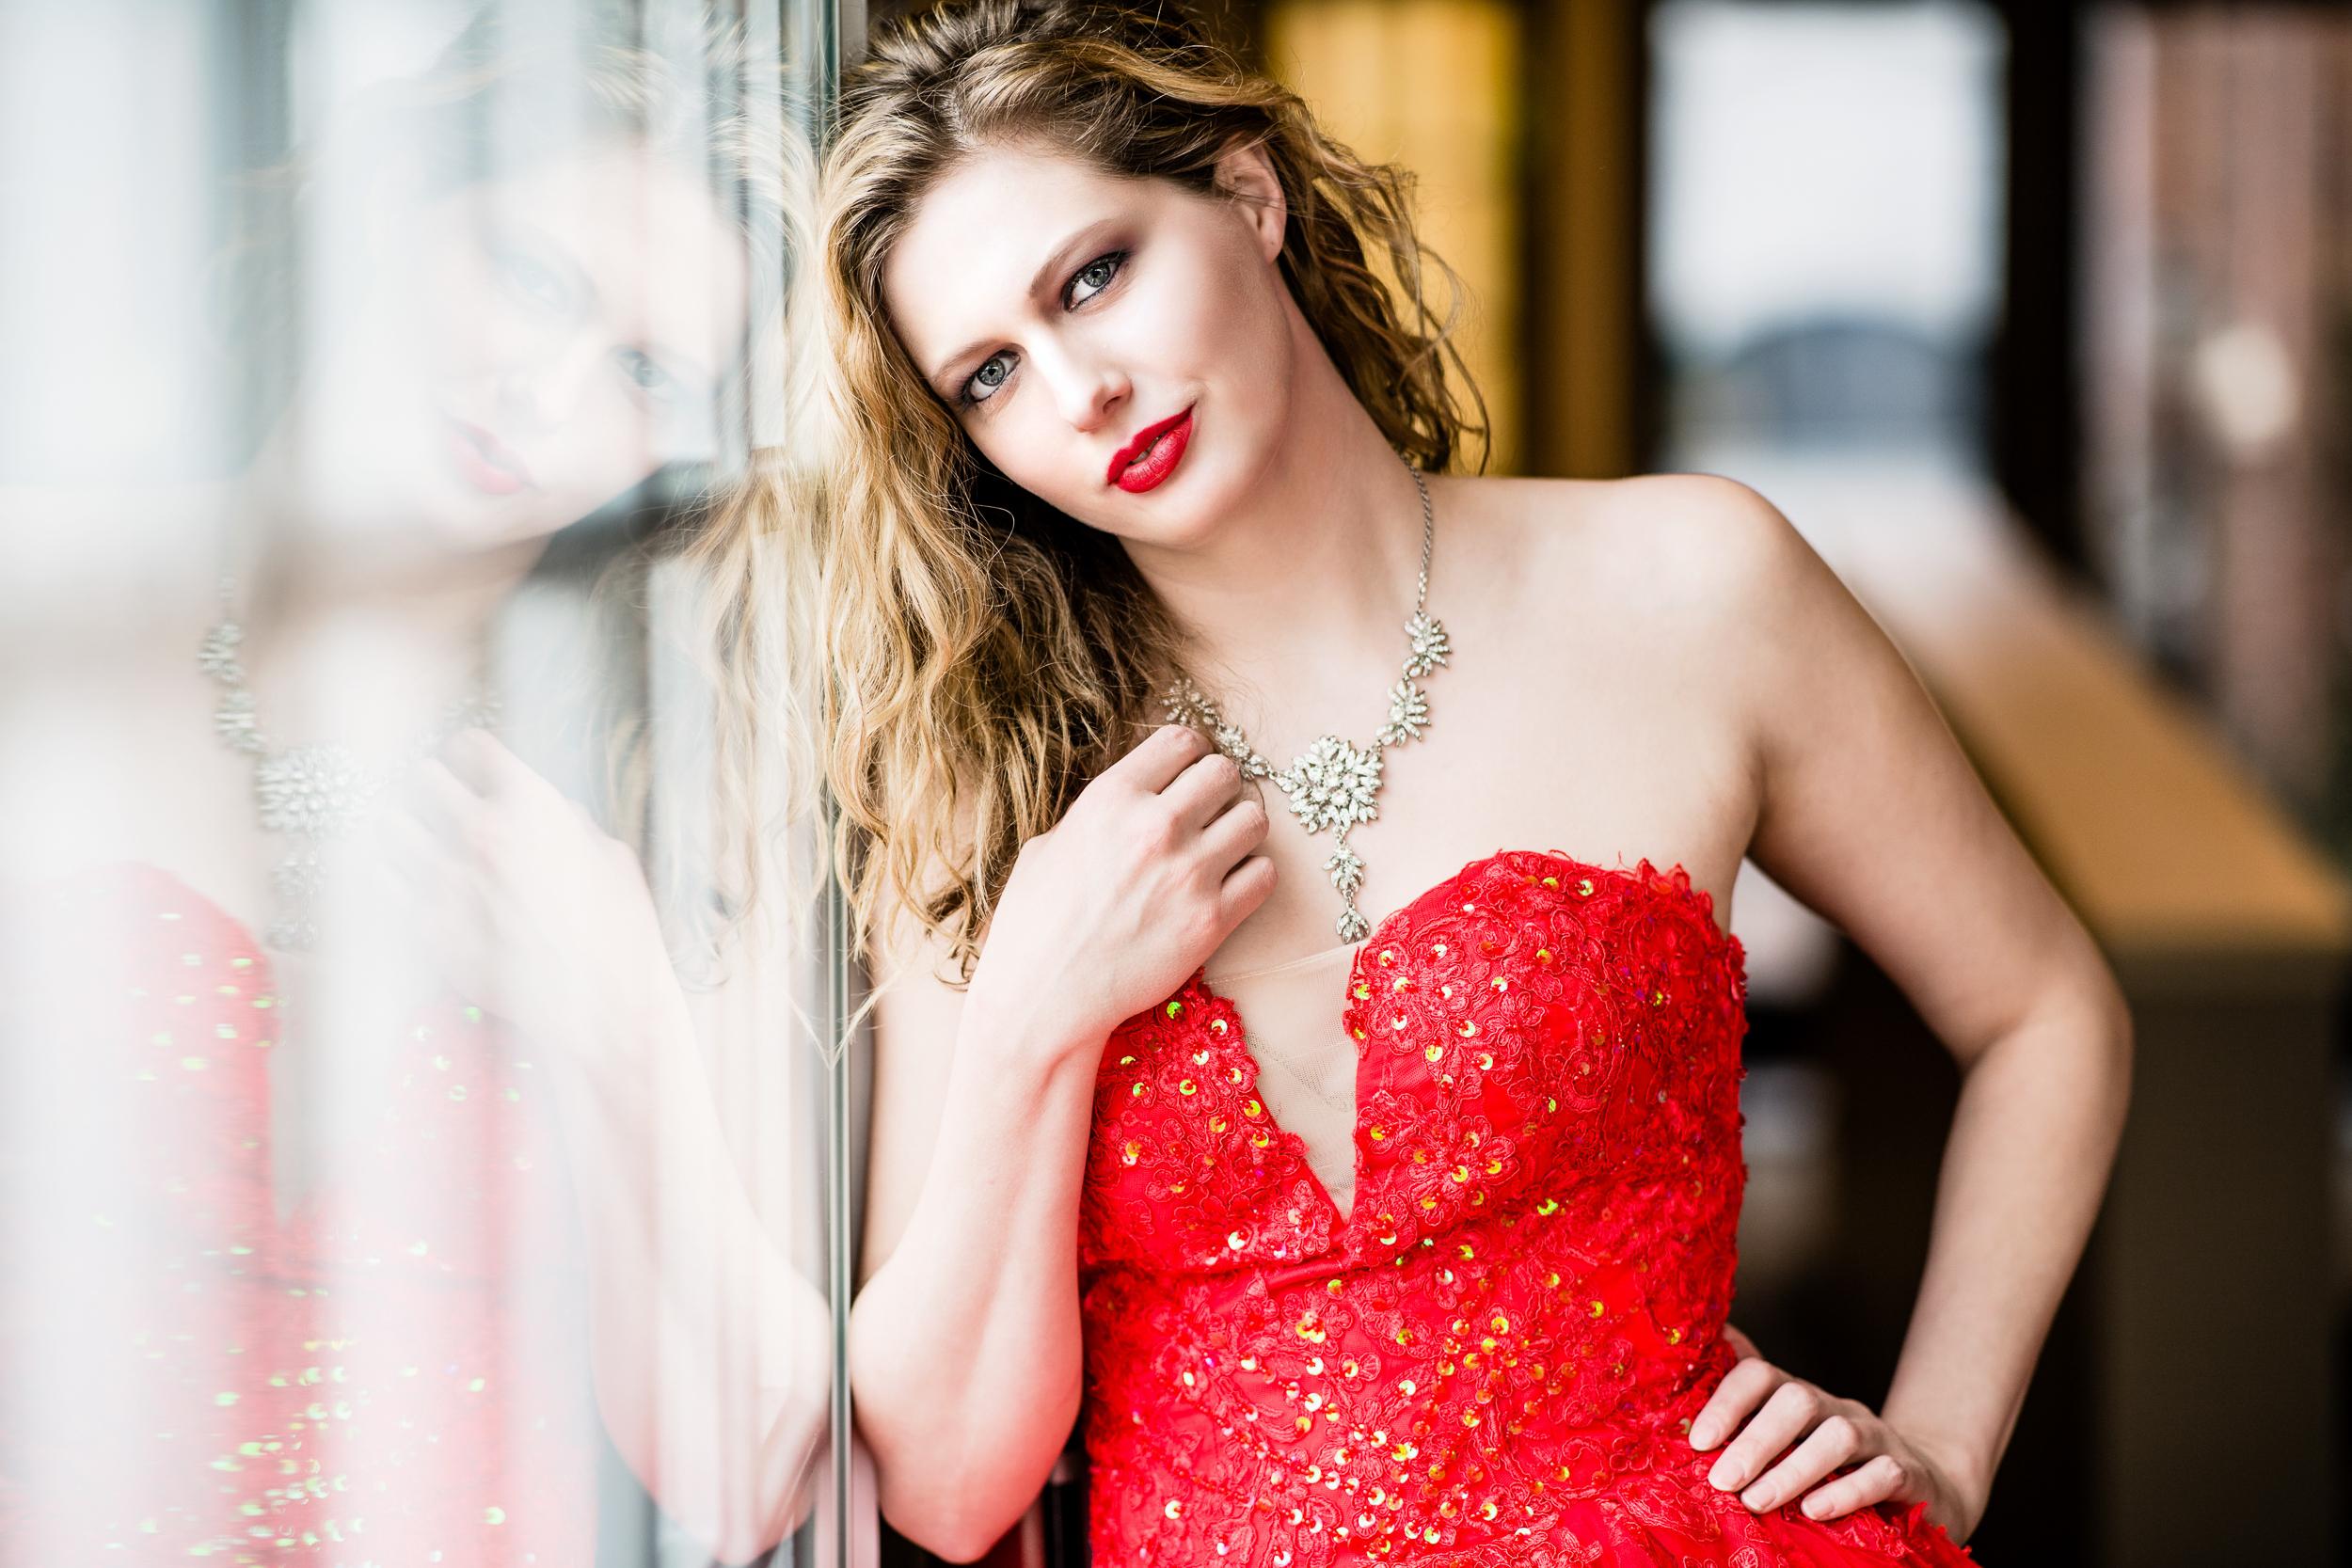 woman-red-dress-window-reflection.jpg